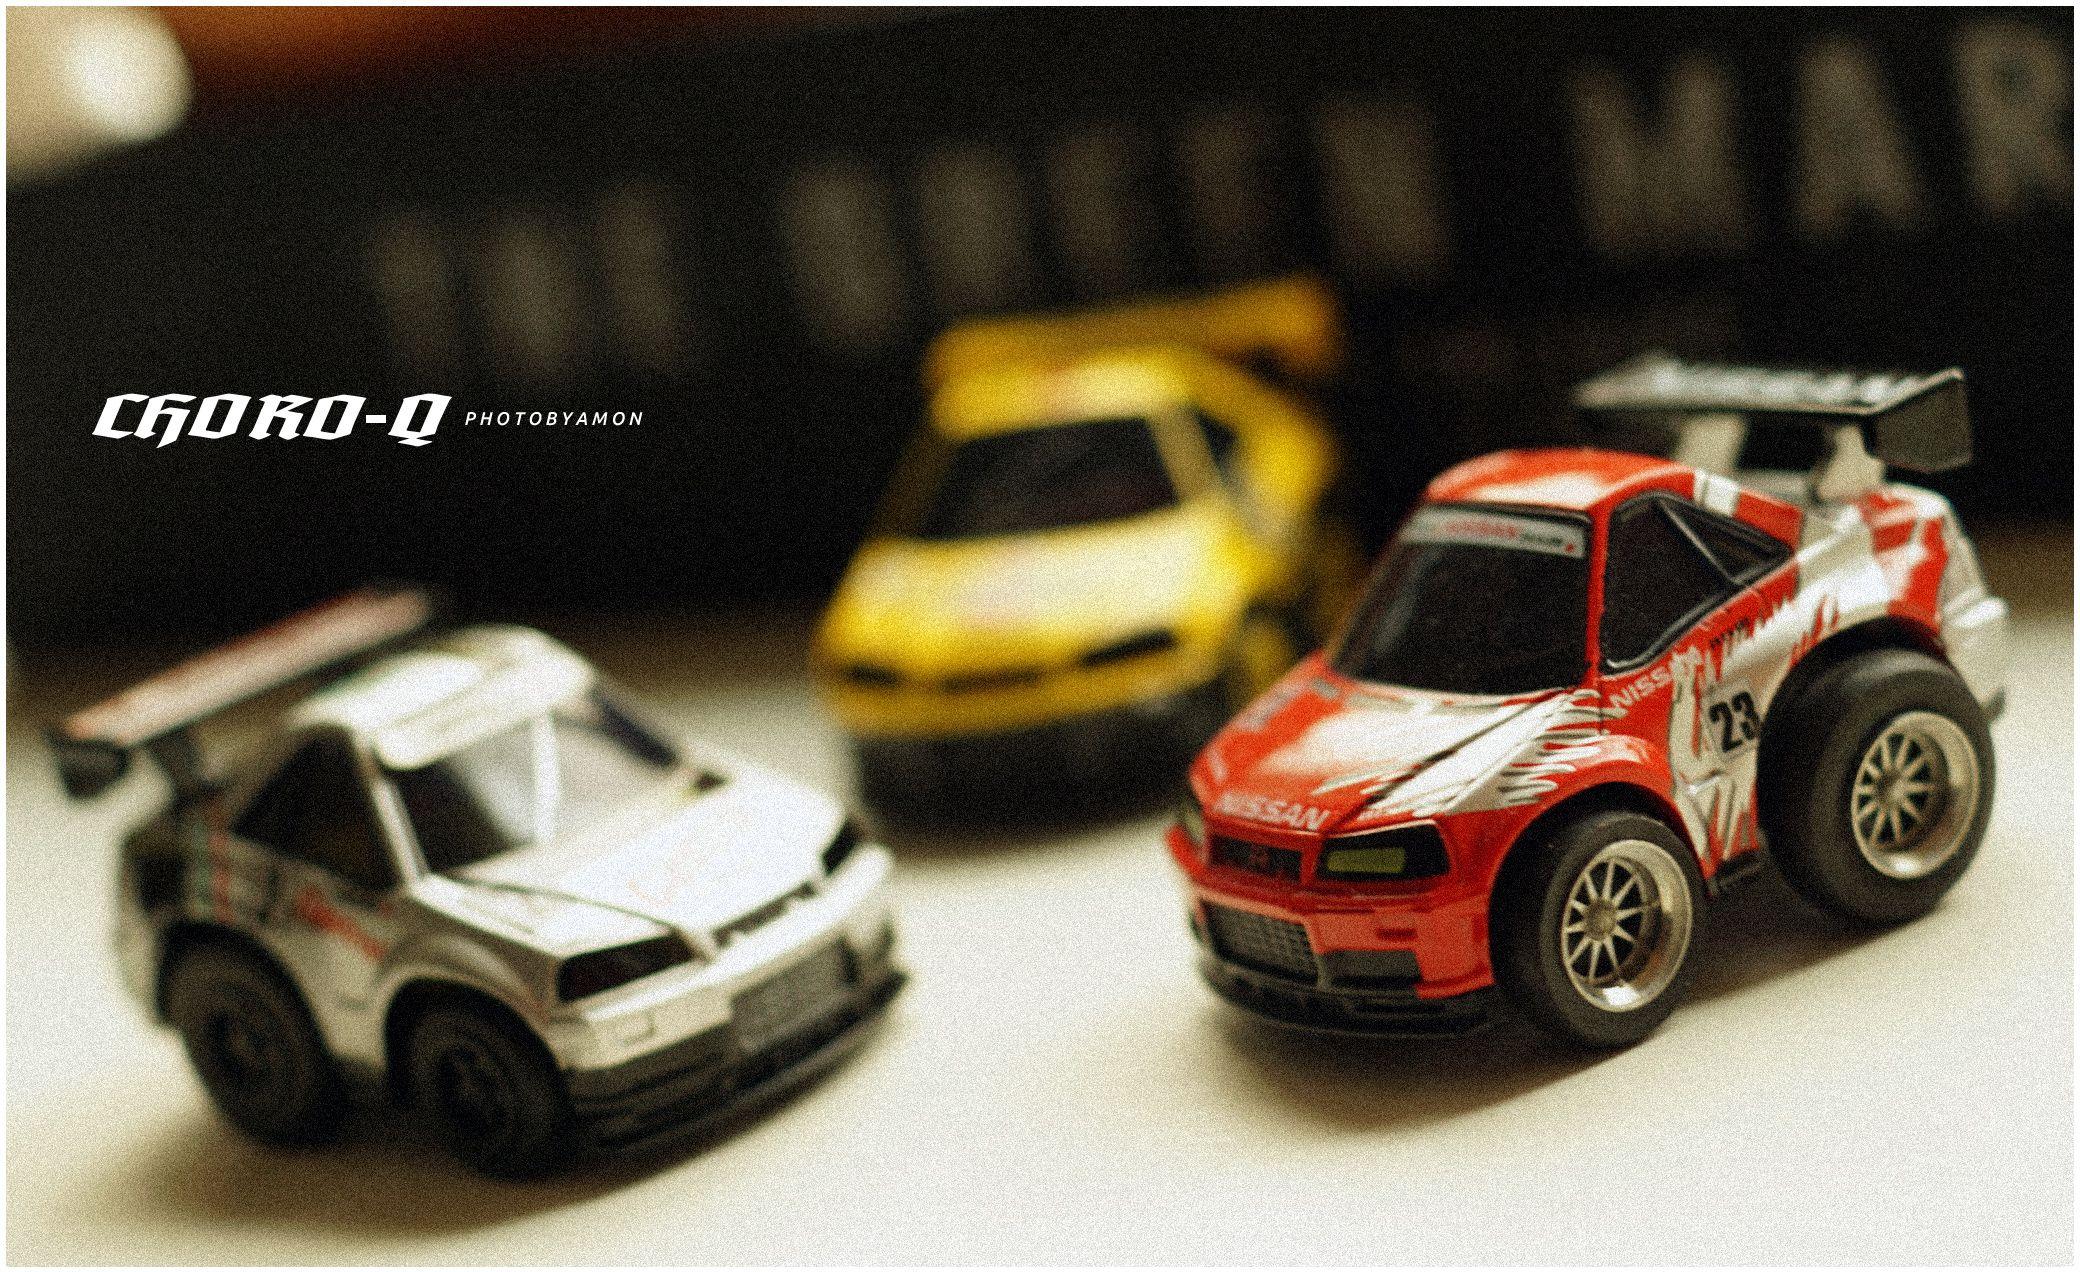 Photo By Amon Smart Cars Choro Q Q Car Hunter Car Toy Toy Car Toys Car